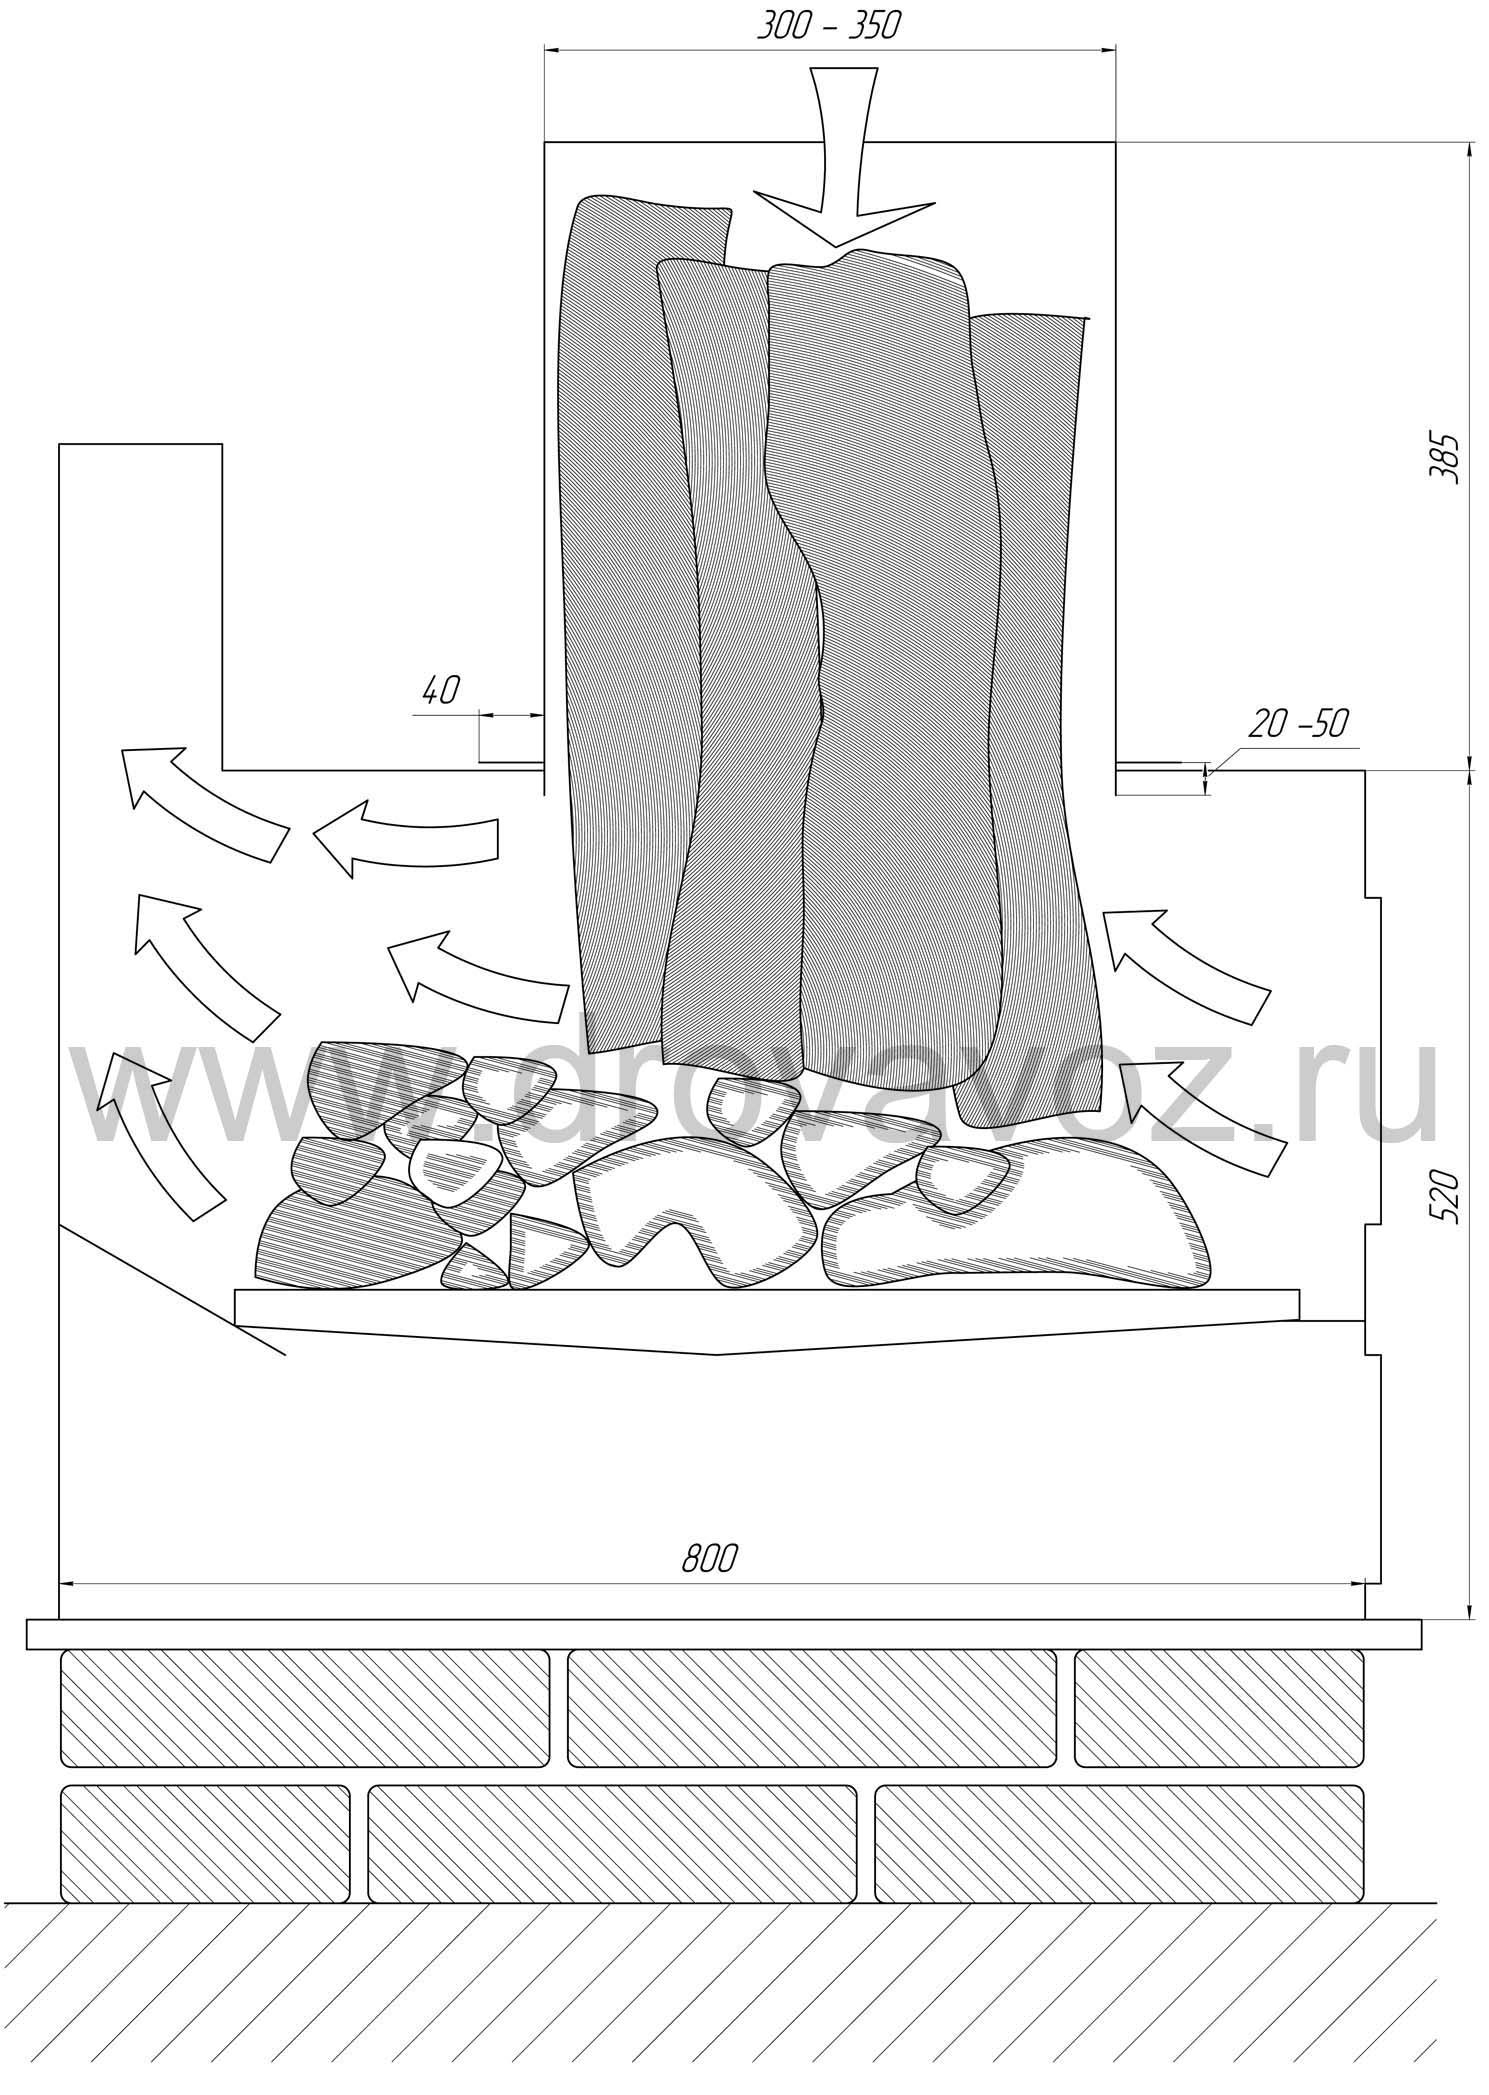 чертеж буржуйки с повышенным КПД